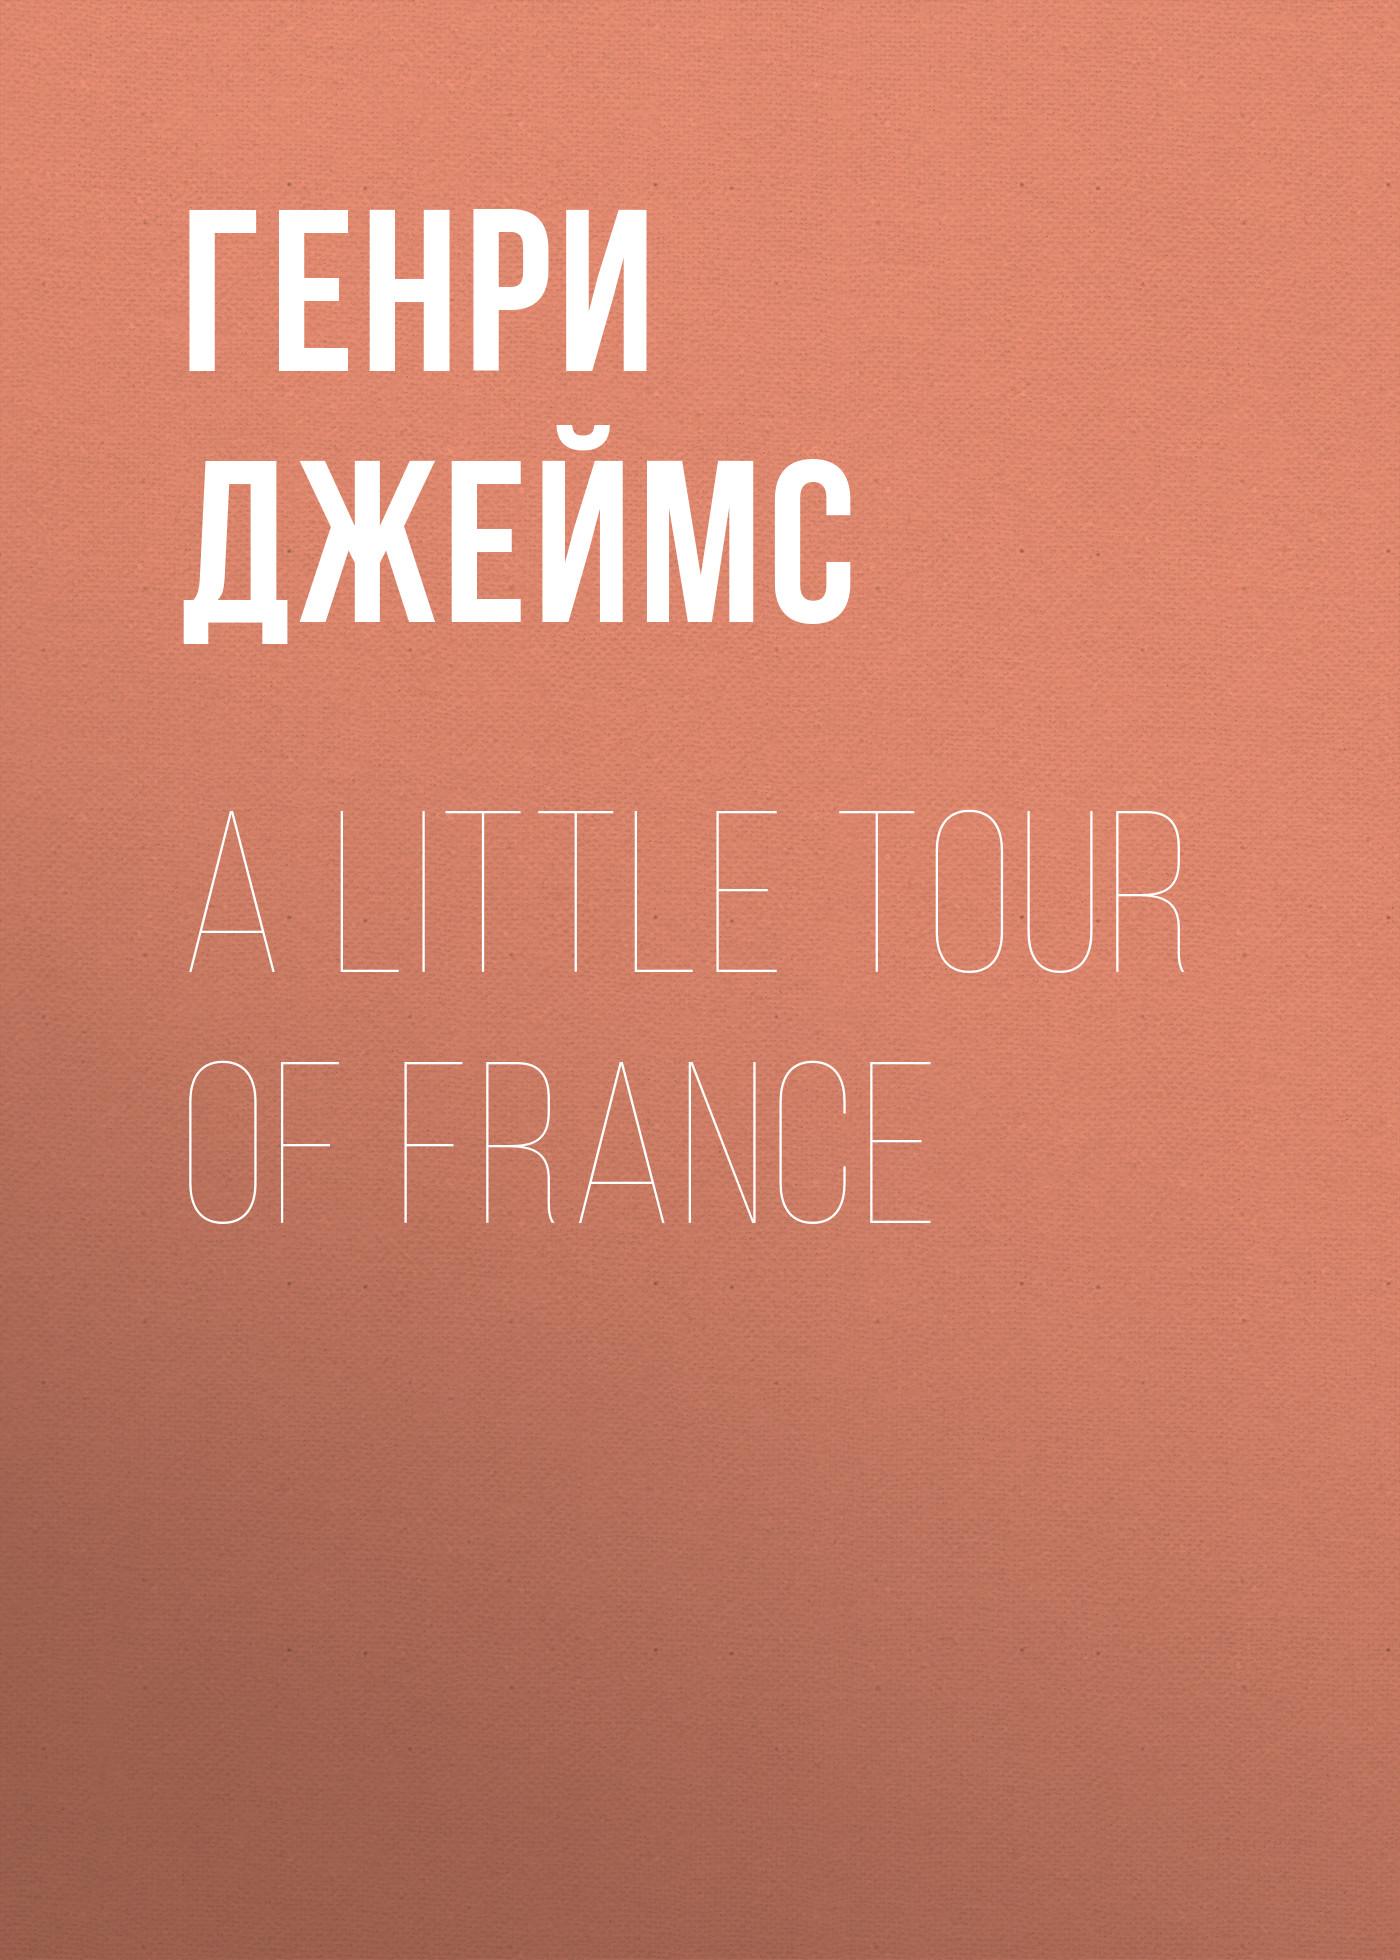 A Little Tour of France